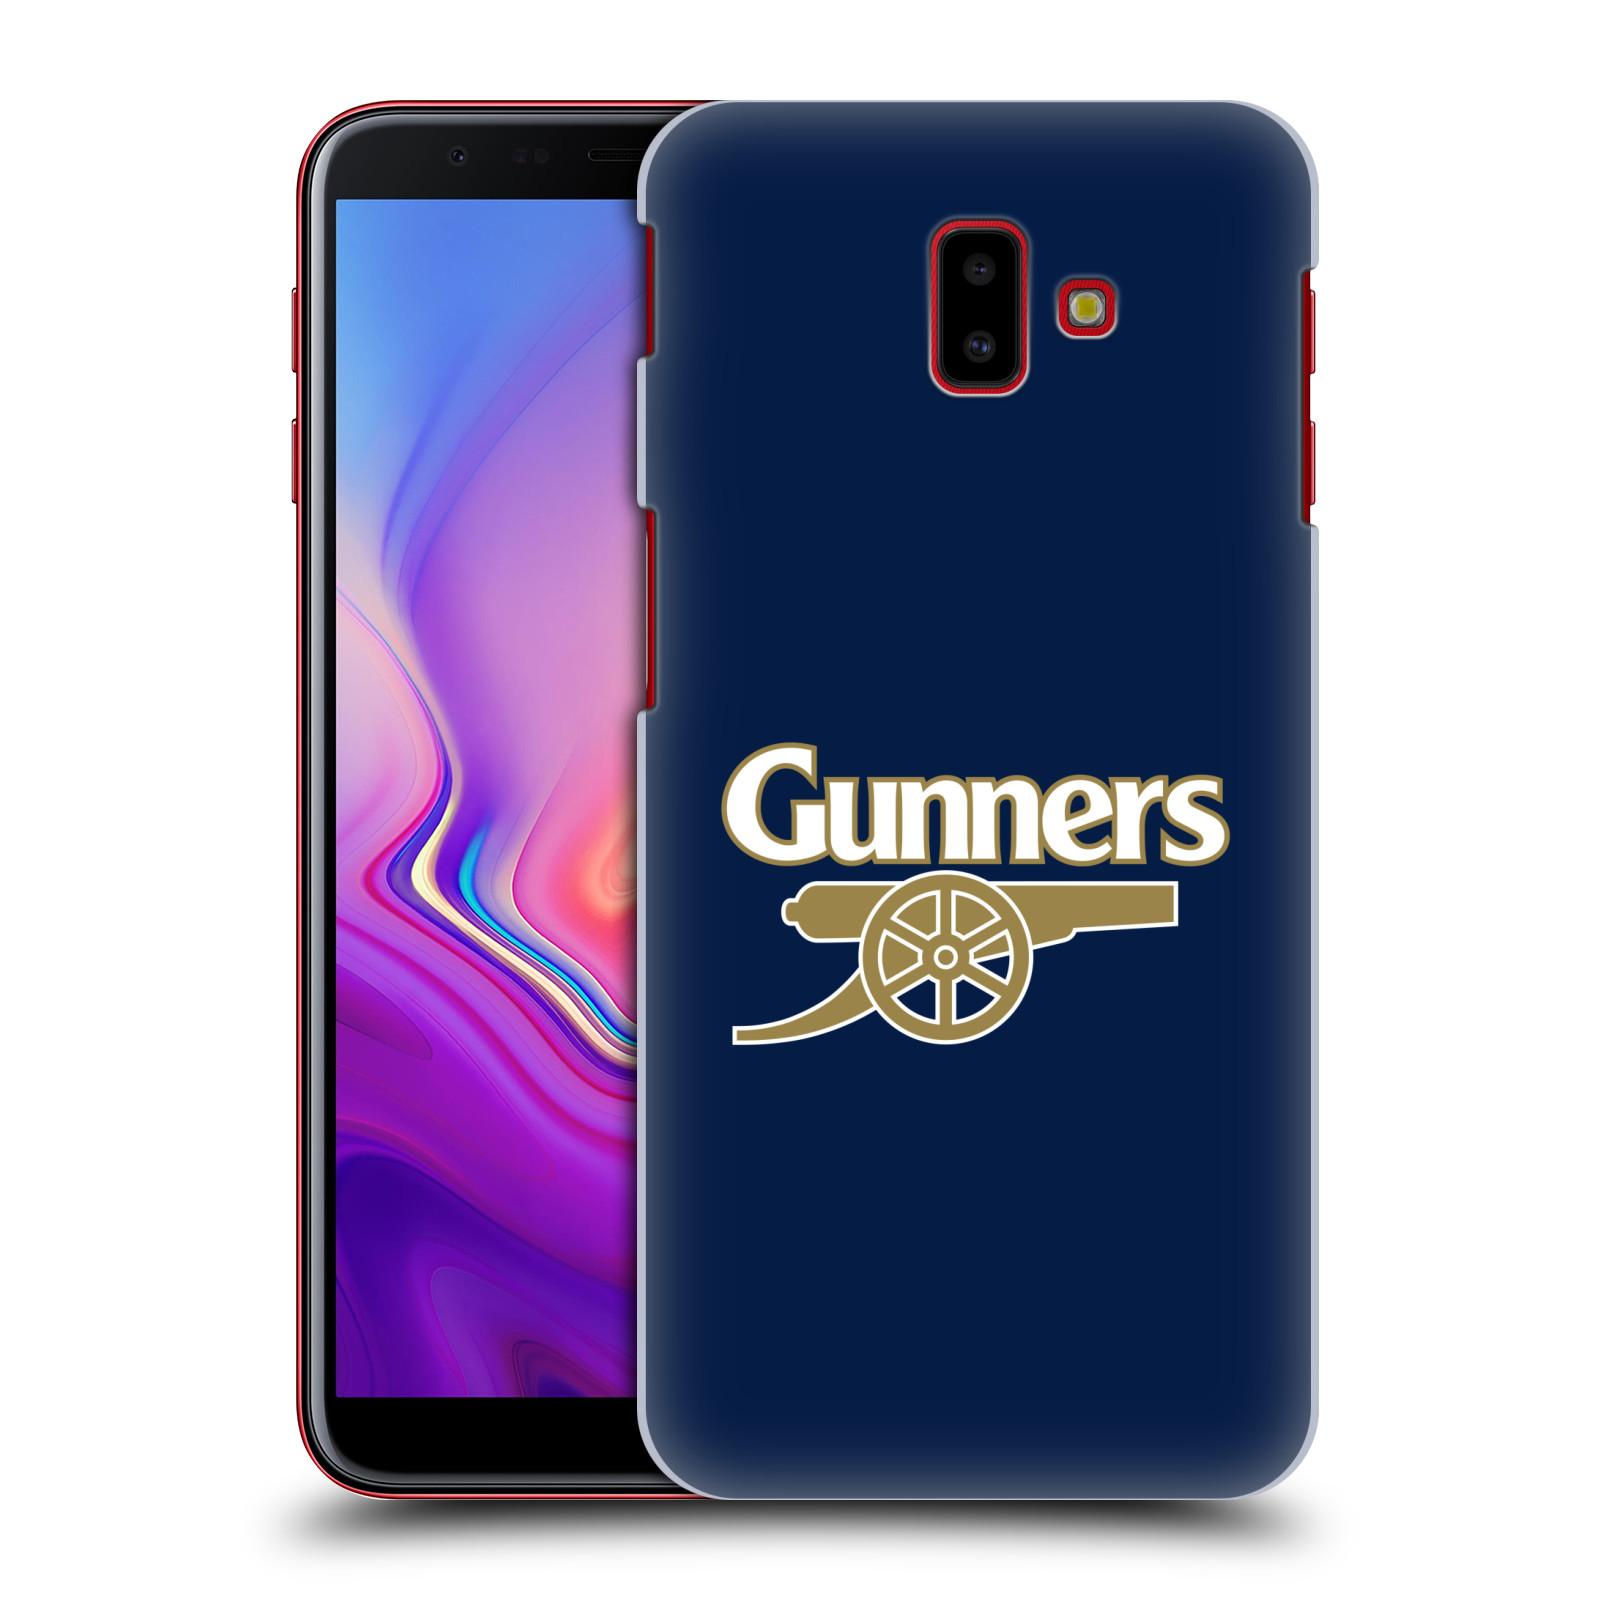 Plastové pouzdro na mobil Samsung Galaxy J6 Plus - Head Case - Arsenal FC - Gunners